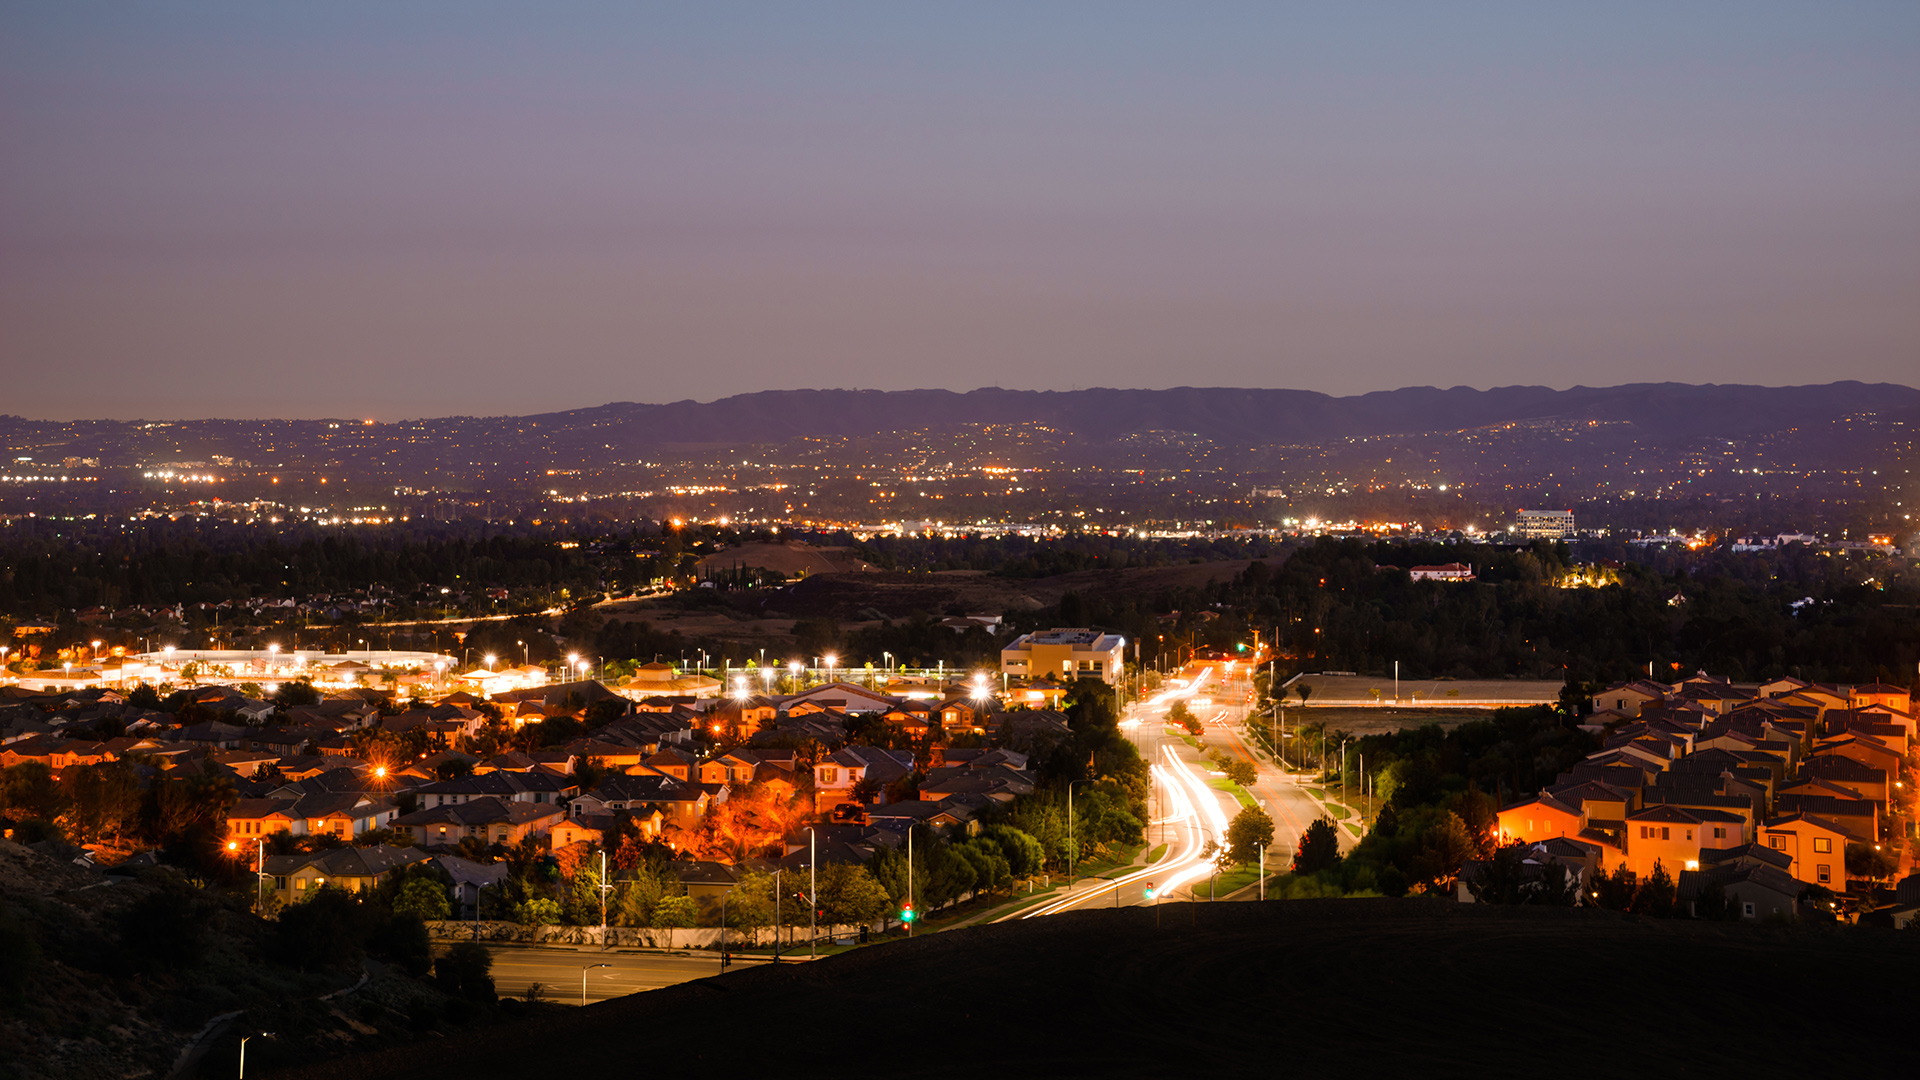 Porter Ranch City lights view